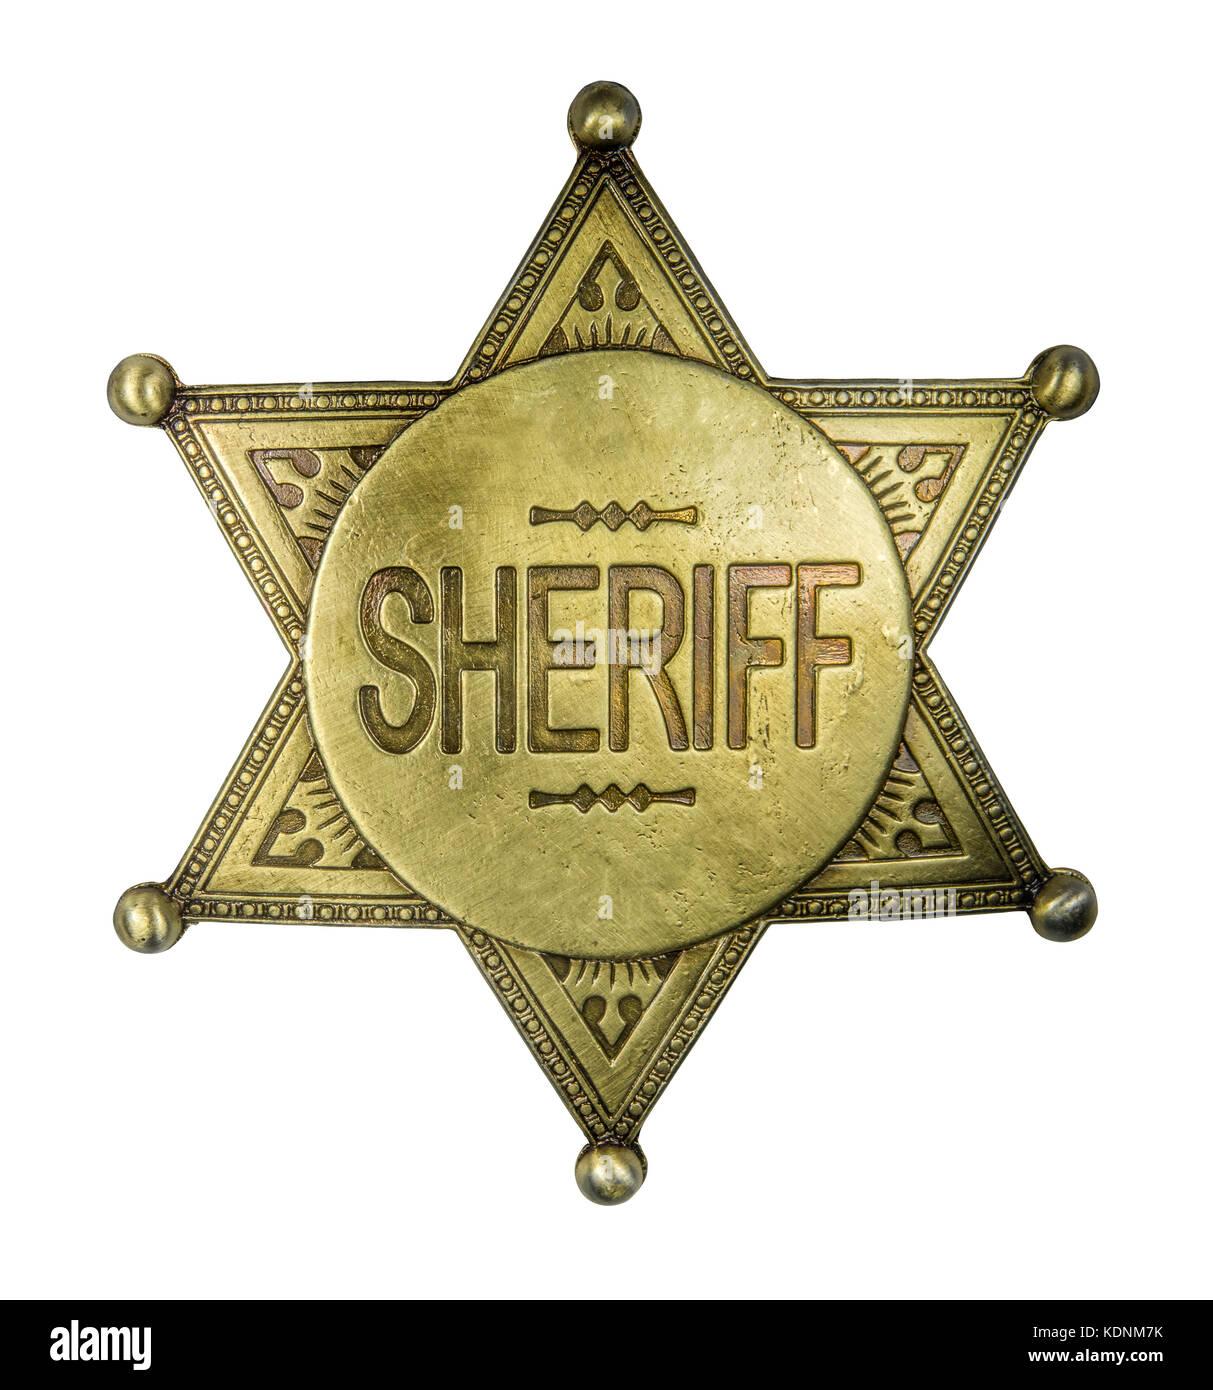 Sheriff badge stock photos sheriff badge stock images - Fbi badge wallpaper ...